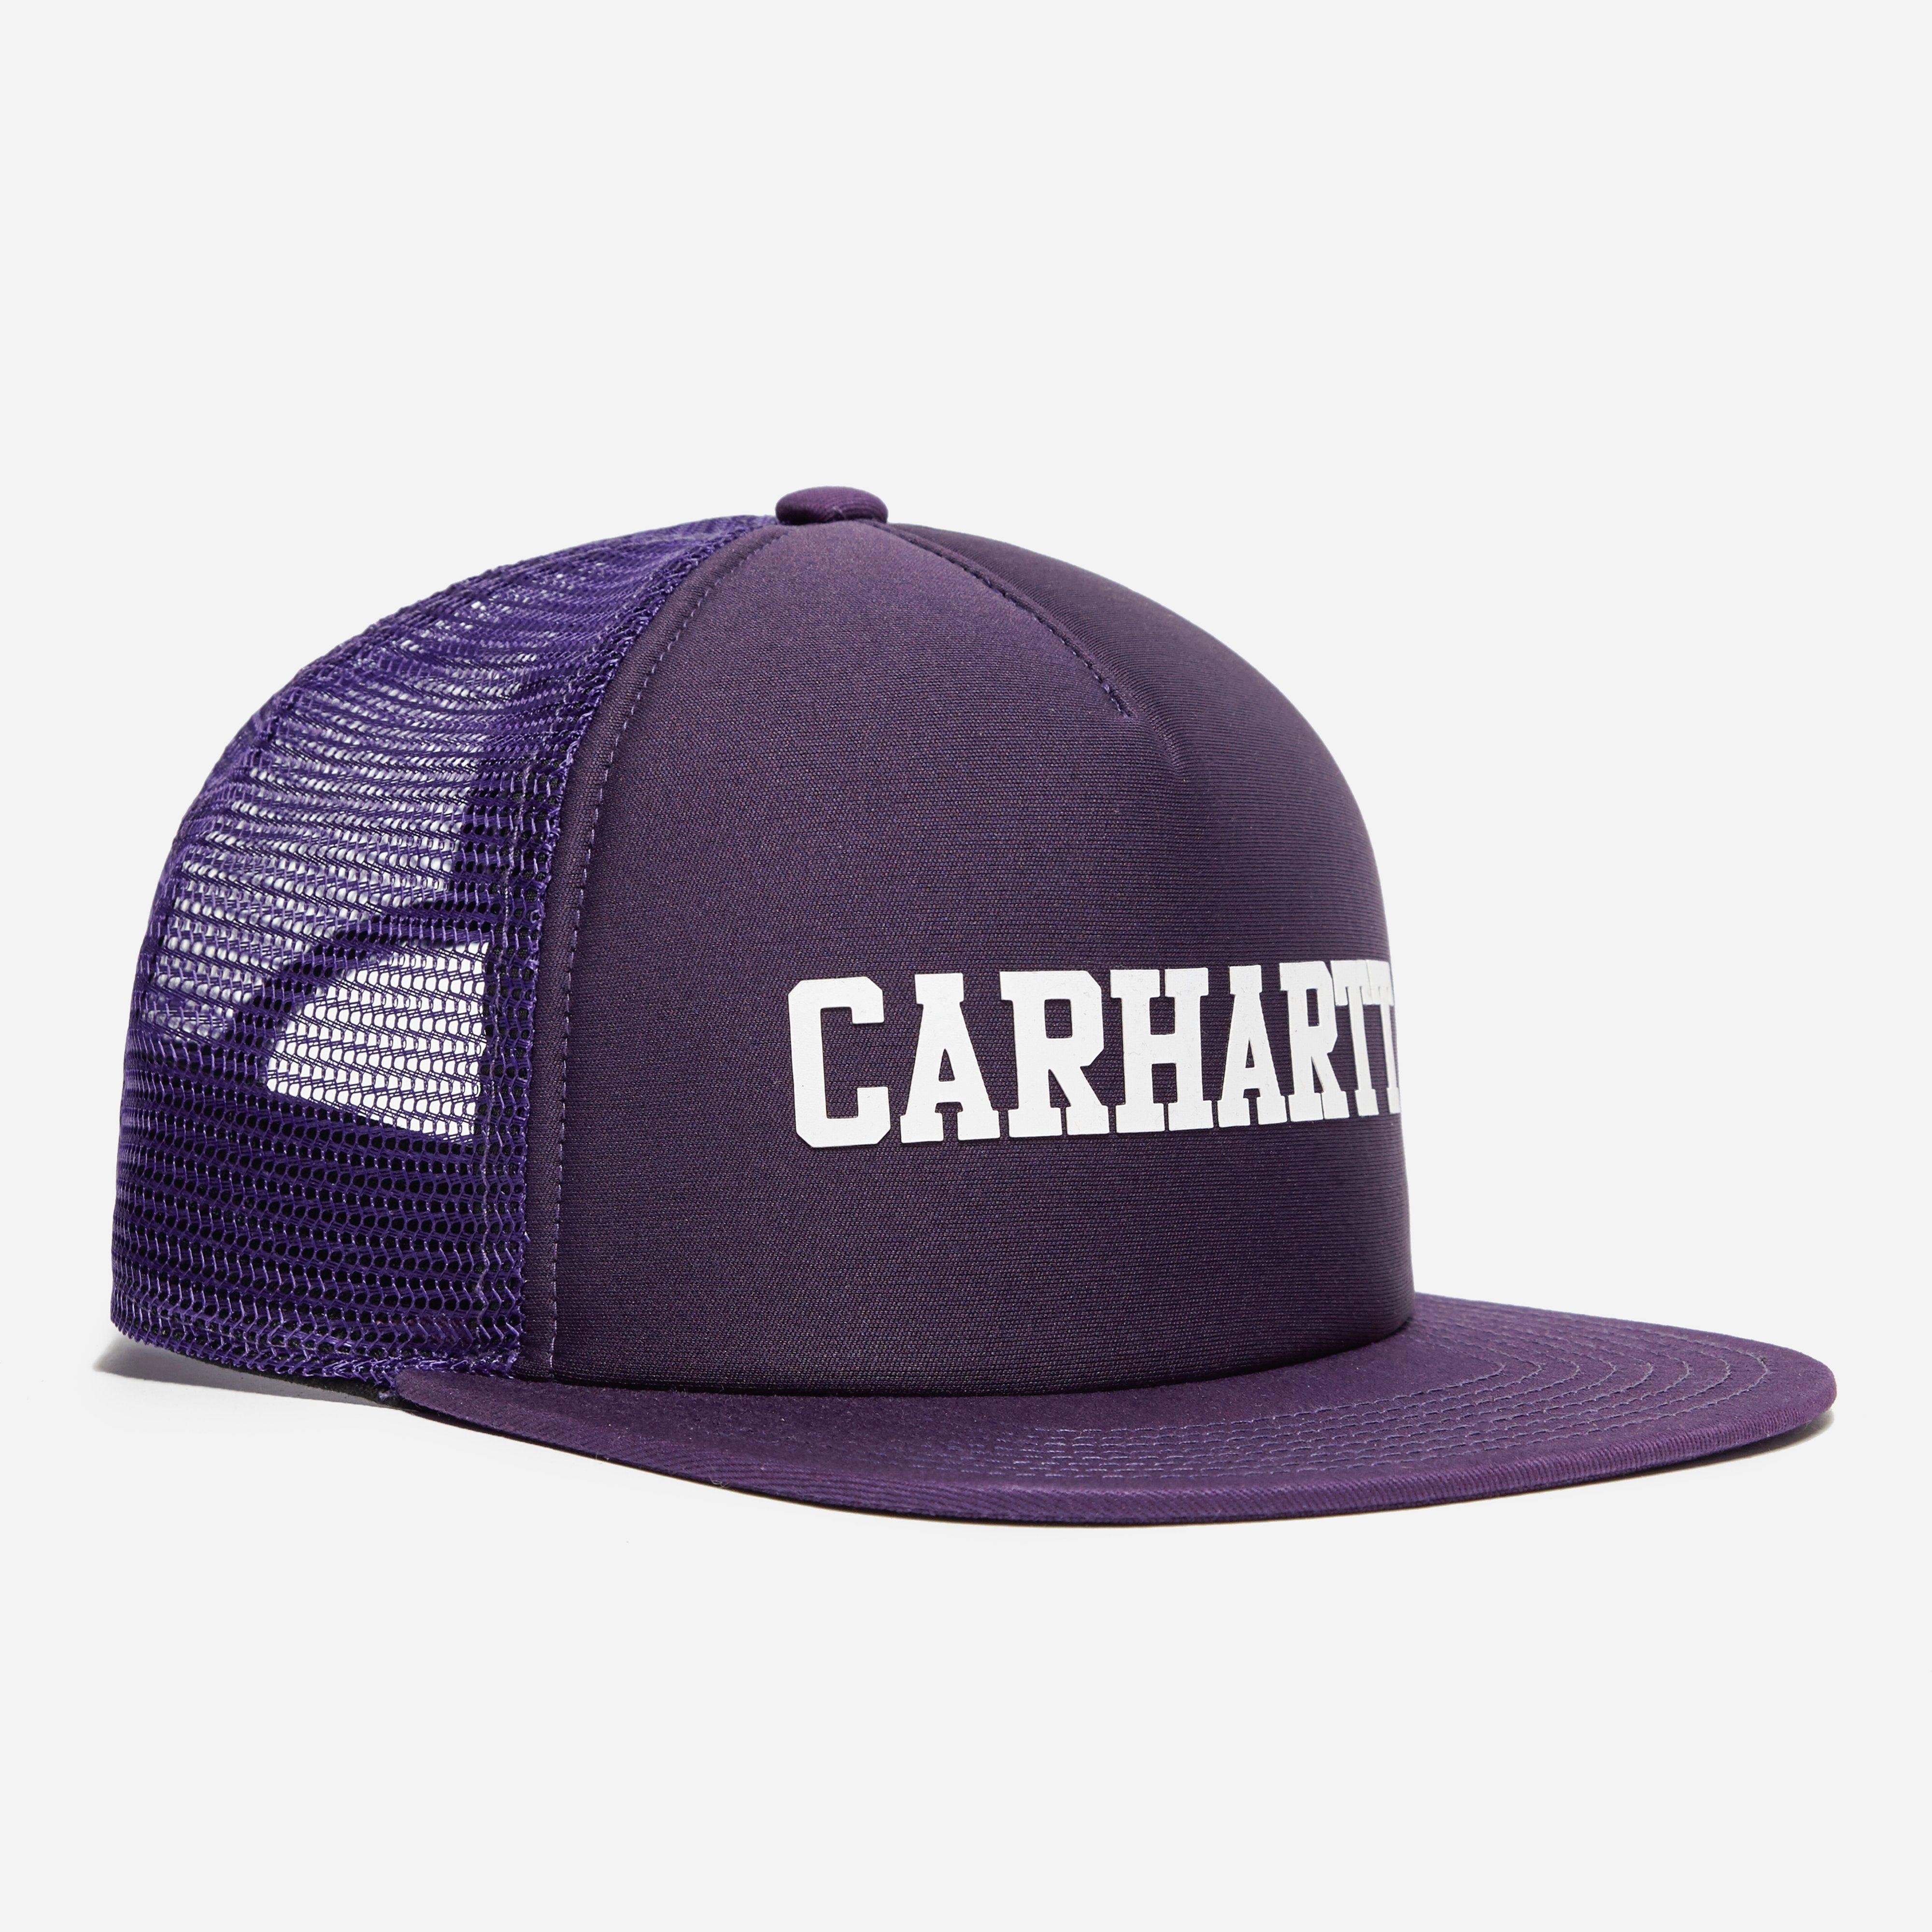 Carhartt WIP Carhartt WIP College Trucker Cap